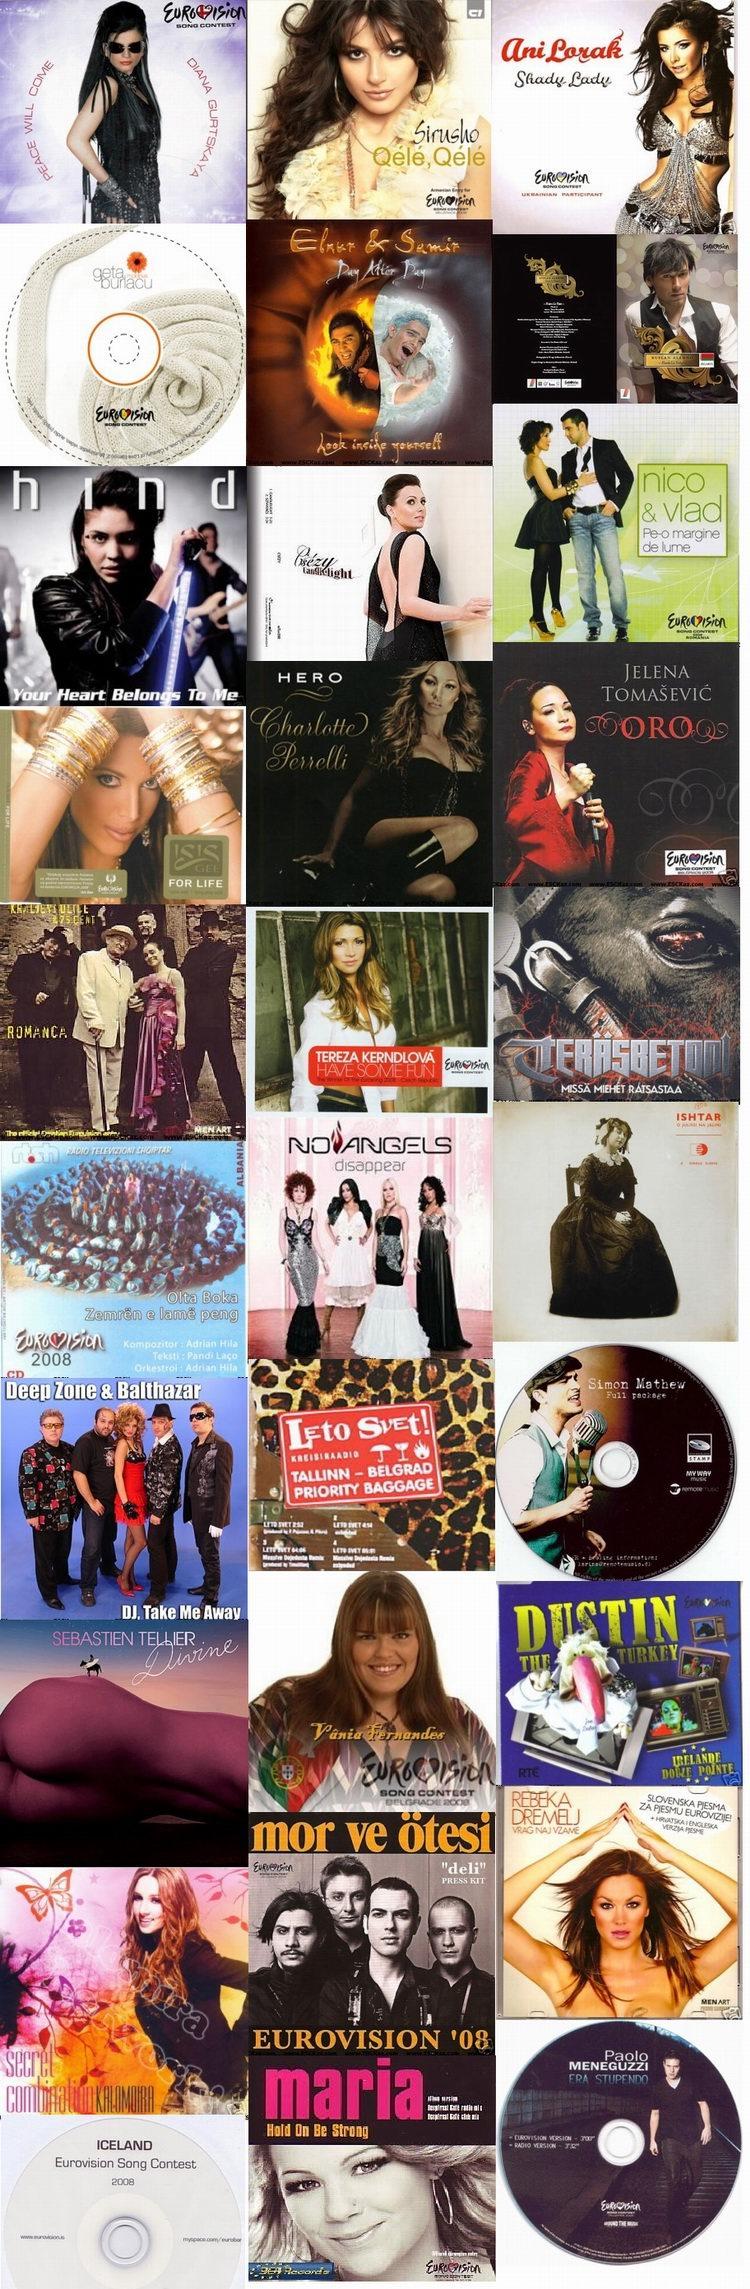 singles08.jpg (404298 bytes)